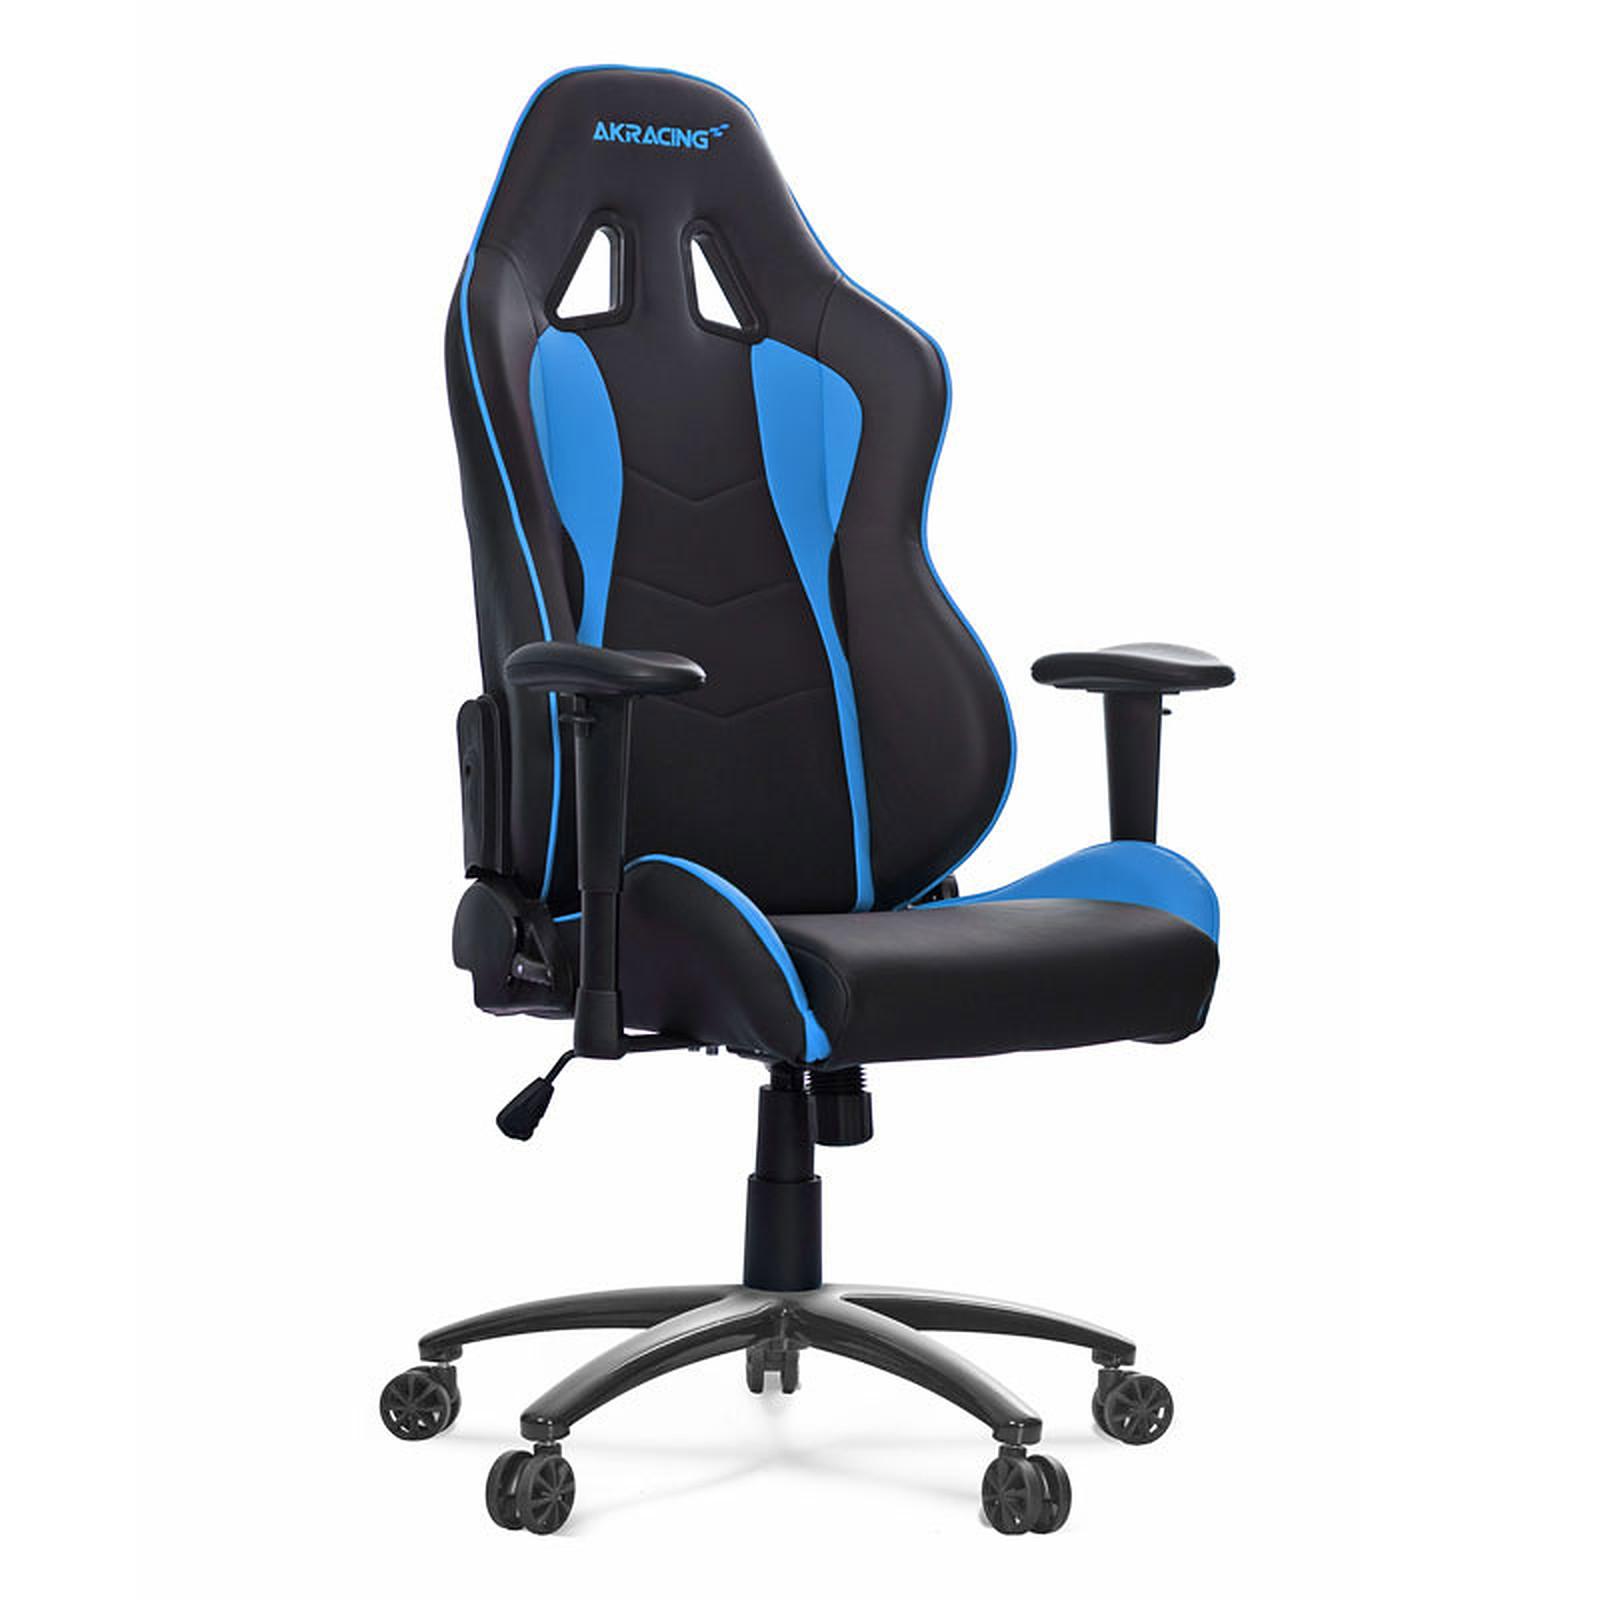 AKRacing AKRacing gamer Gaming Nitro ChairbleuFauteuil USzMLqpVG